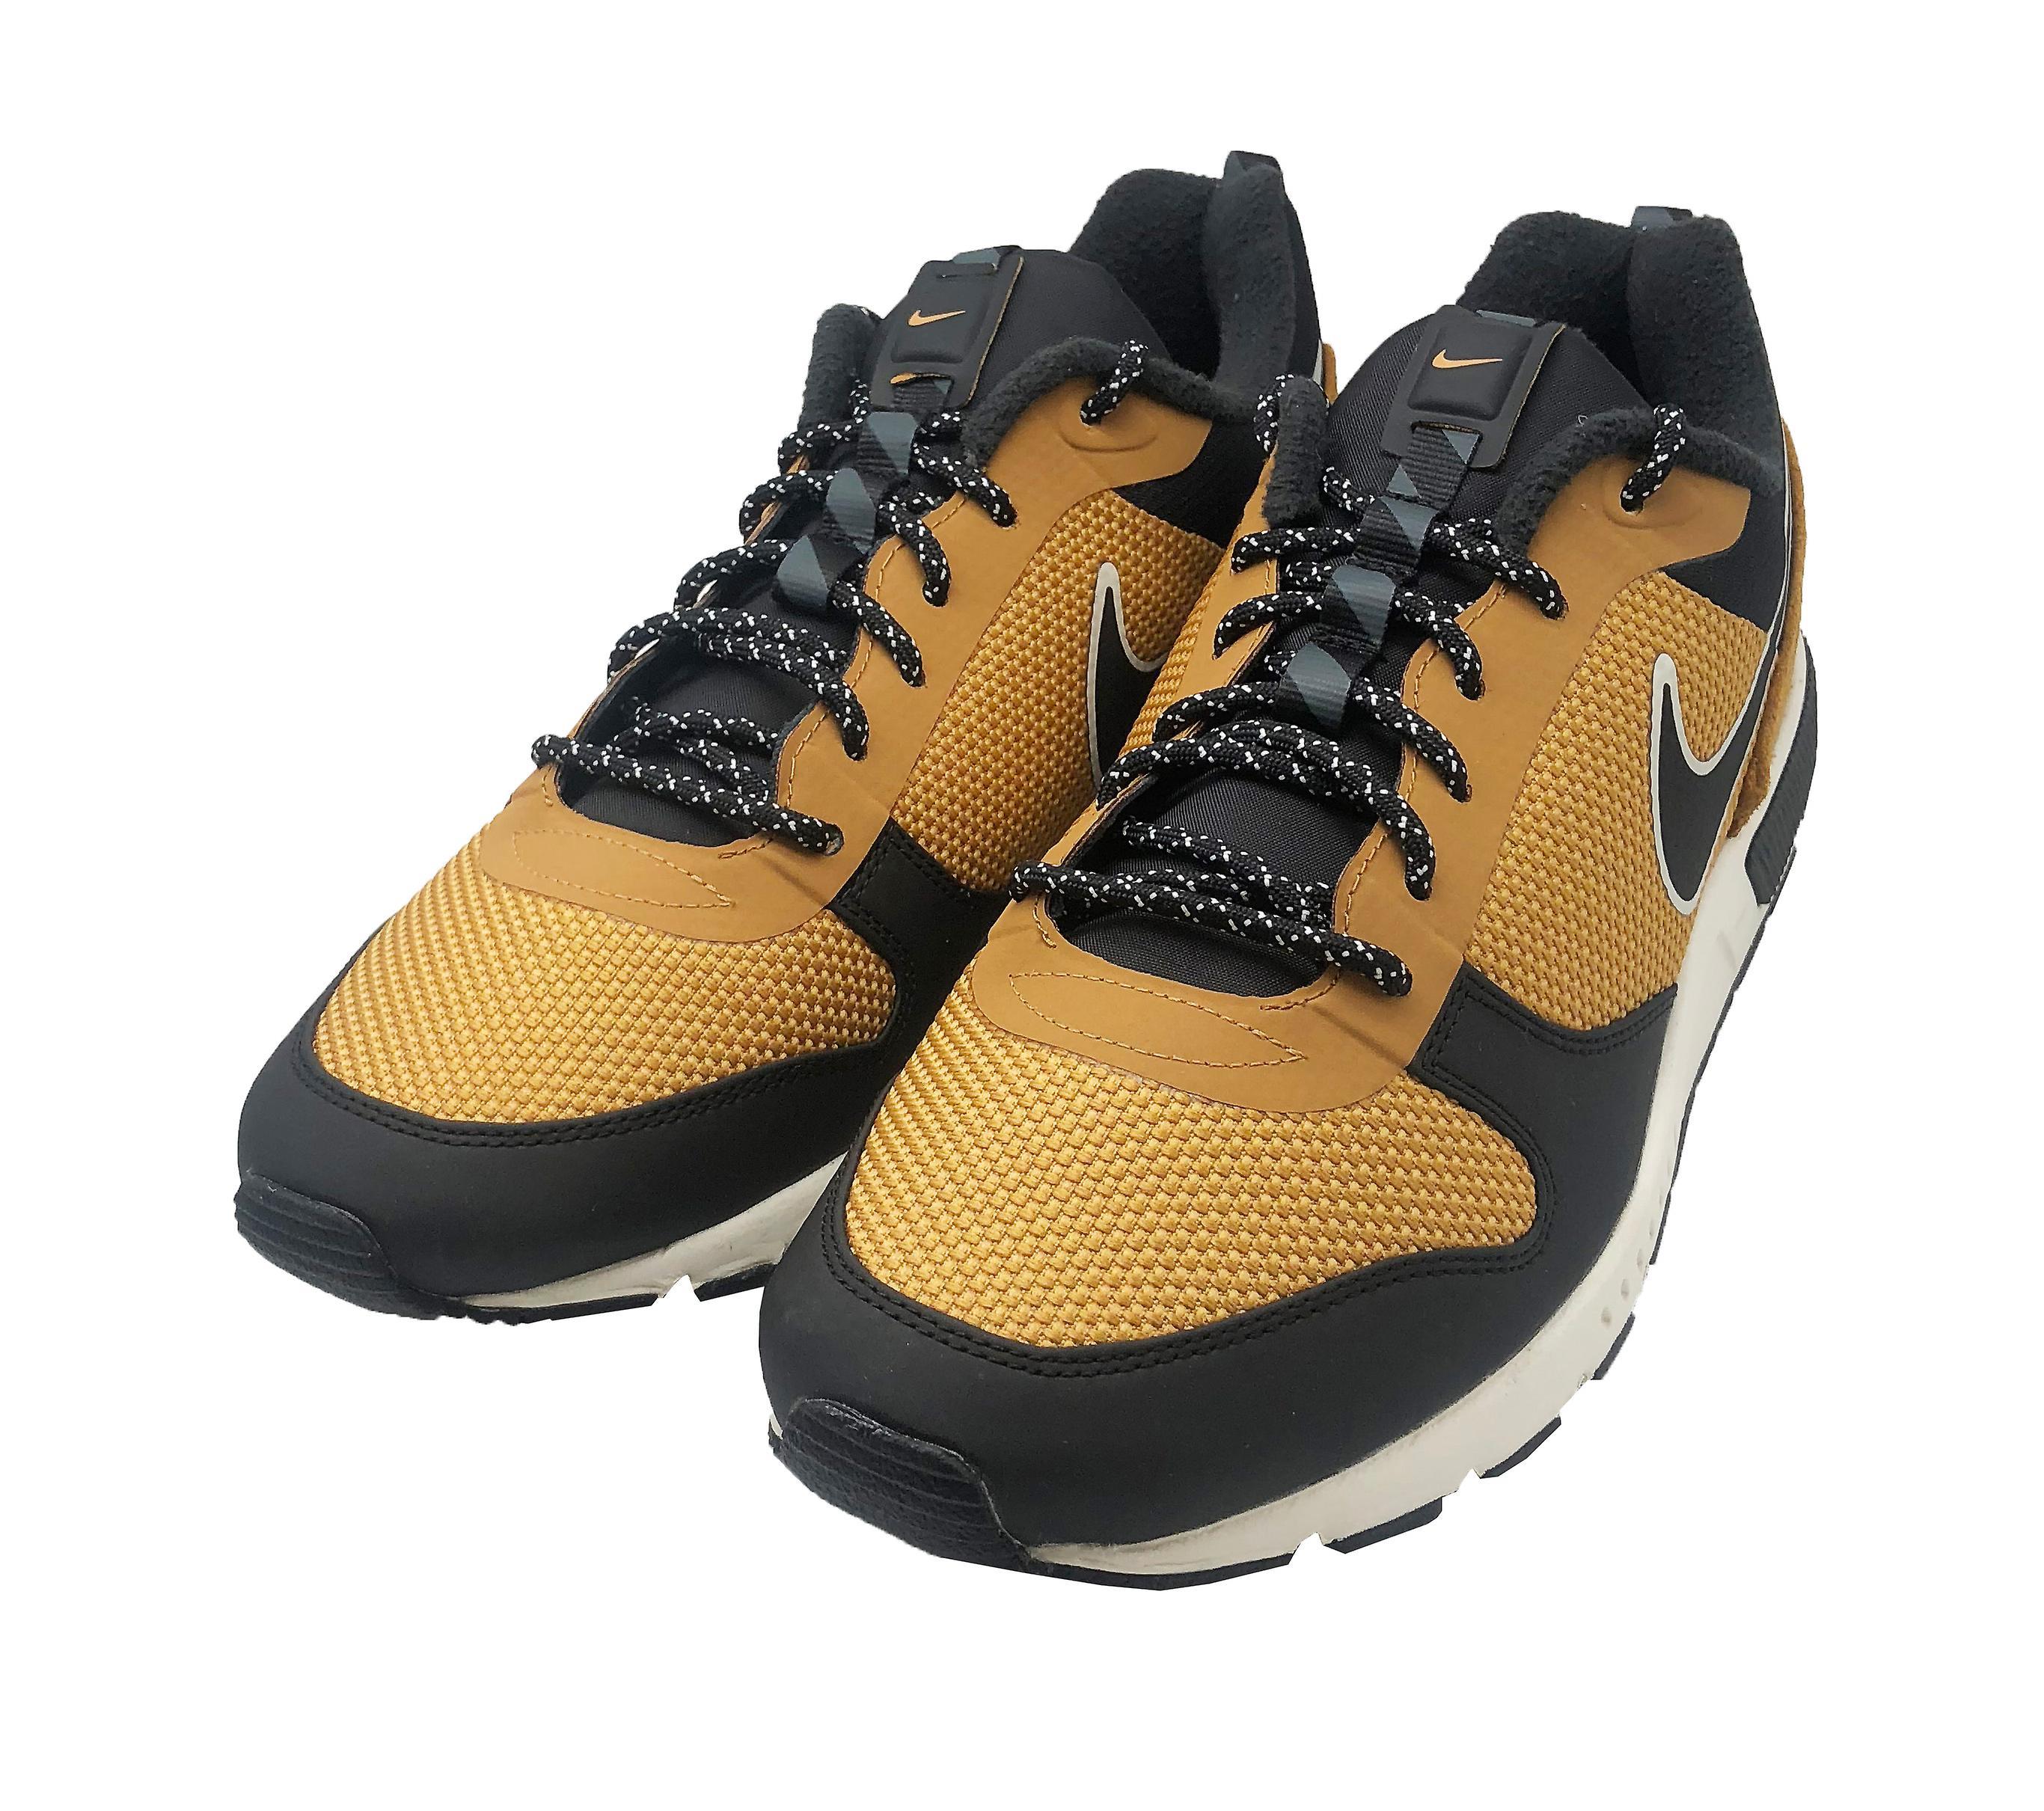 Nike Nightgazer Trail 916775 700 Herren Trainer